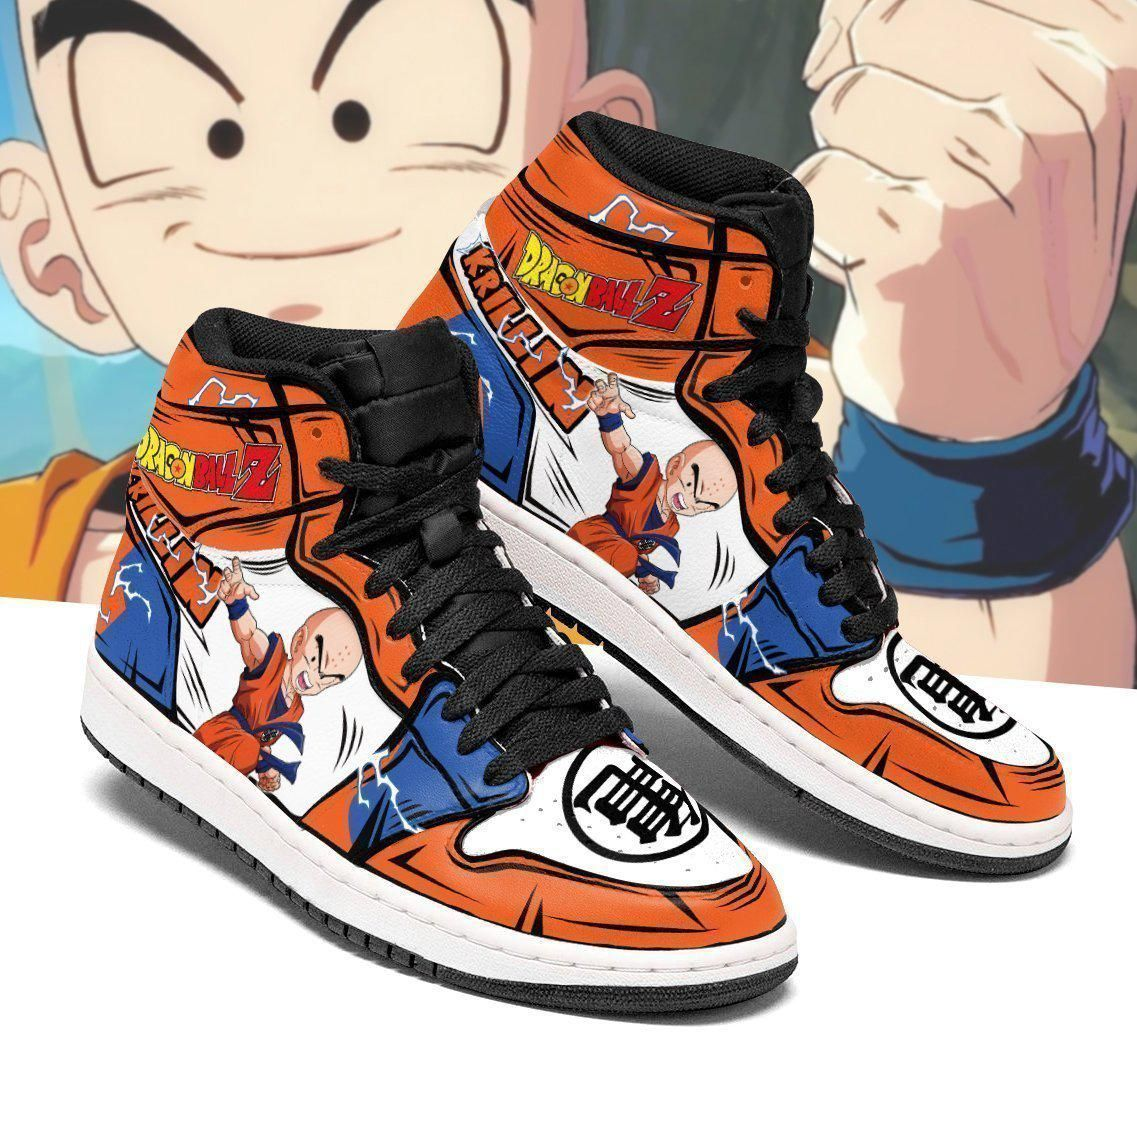 DBZ Krillin Sneakers Custom Anime Dragon Ball Z Shoes GO1210